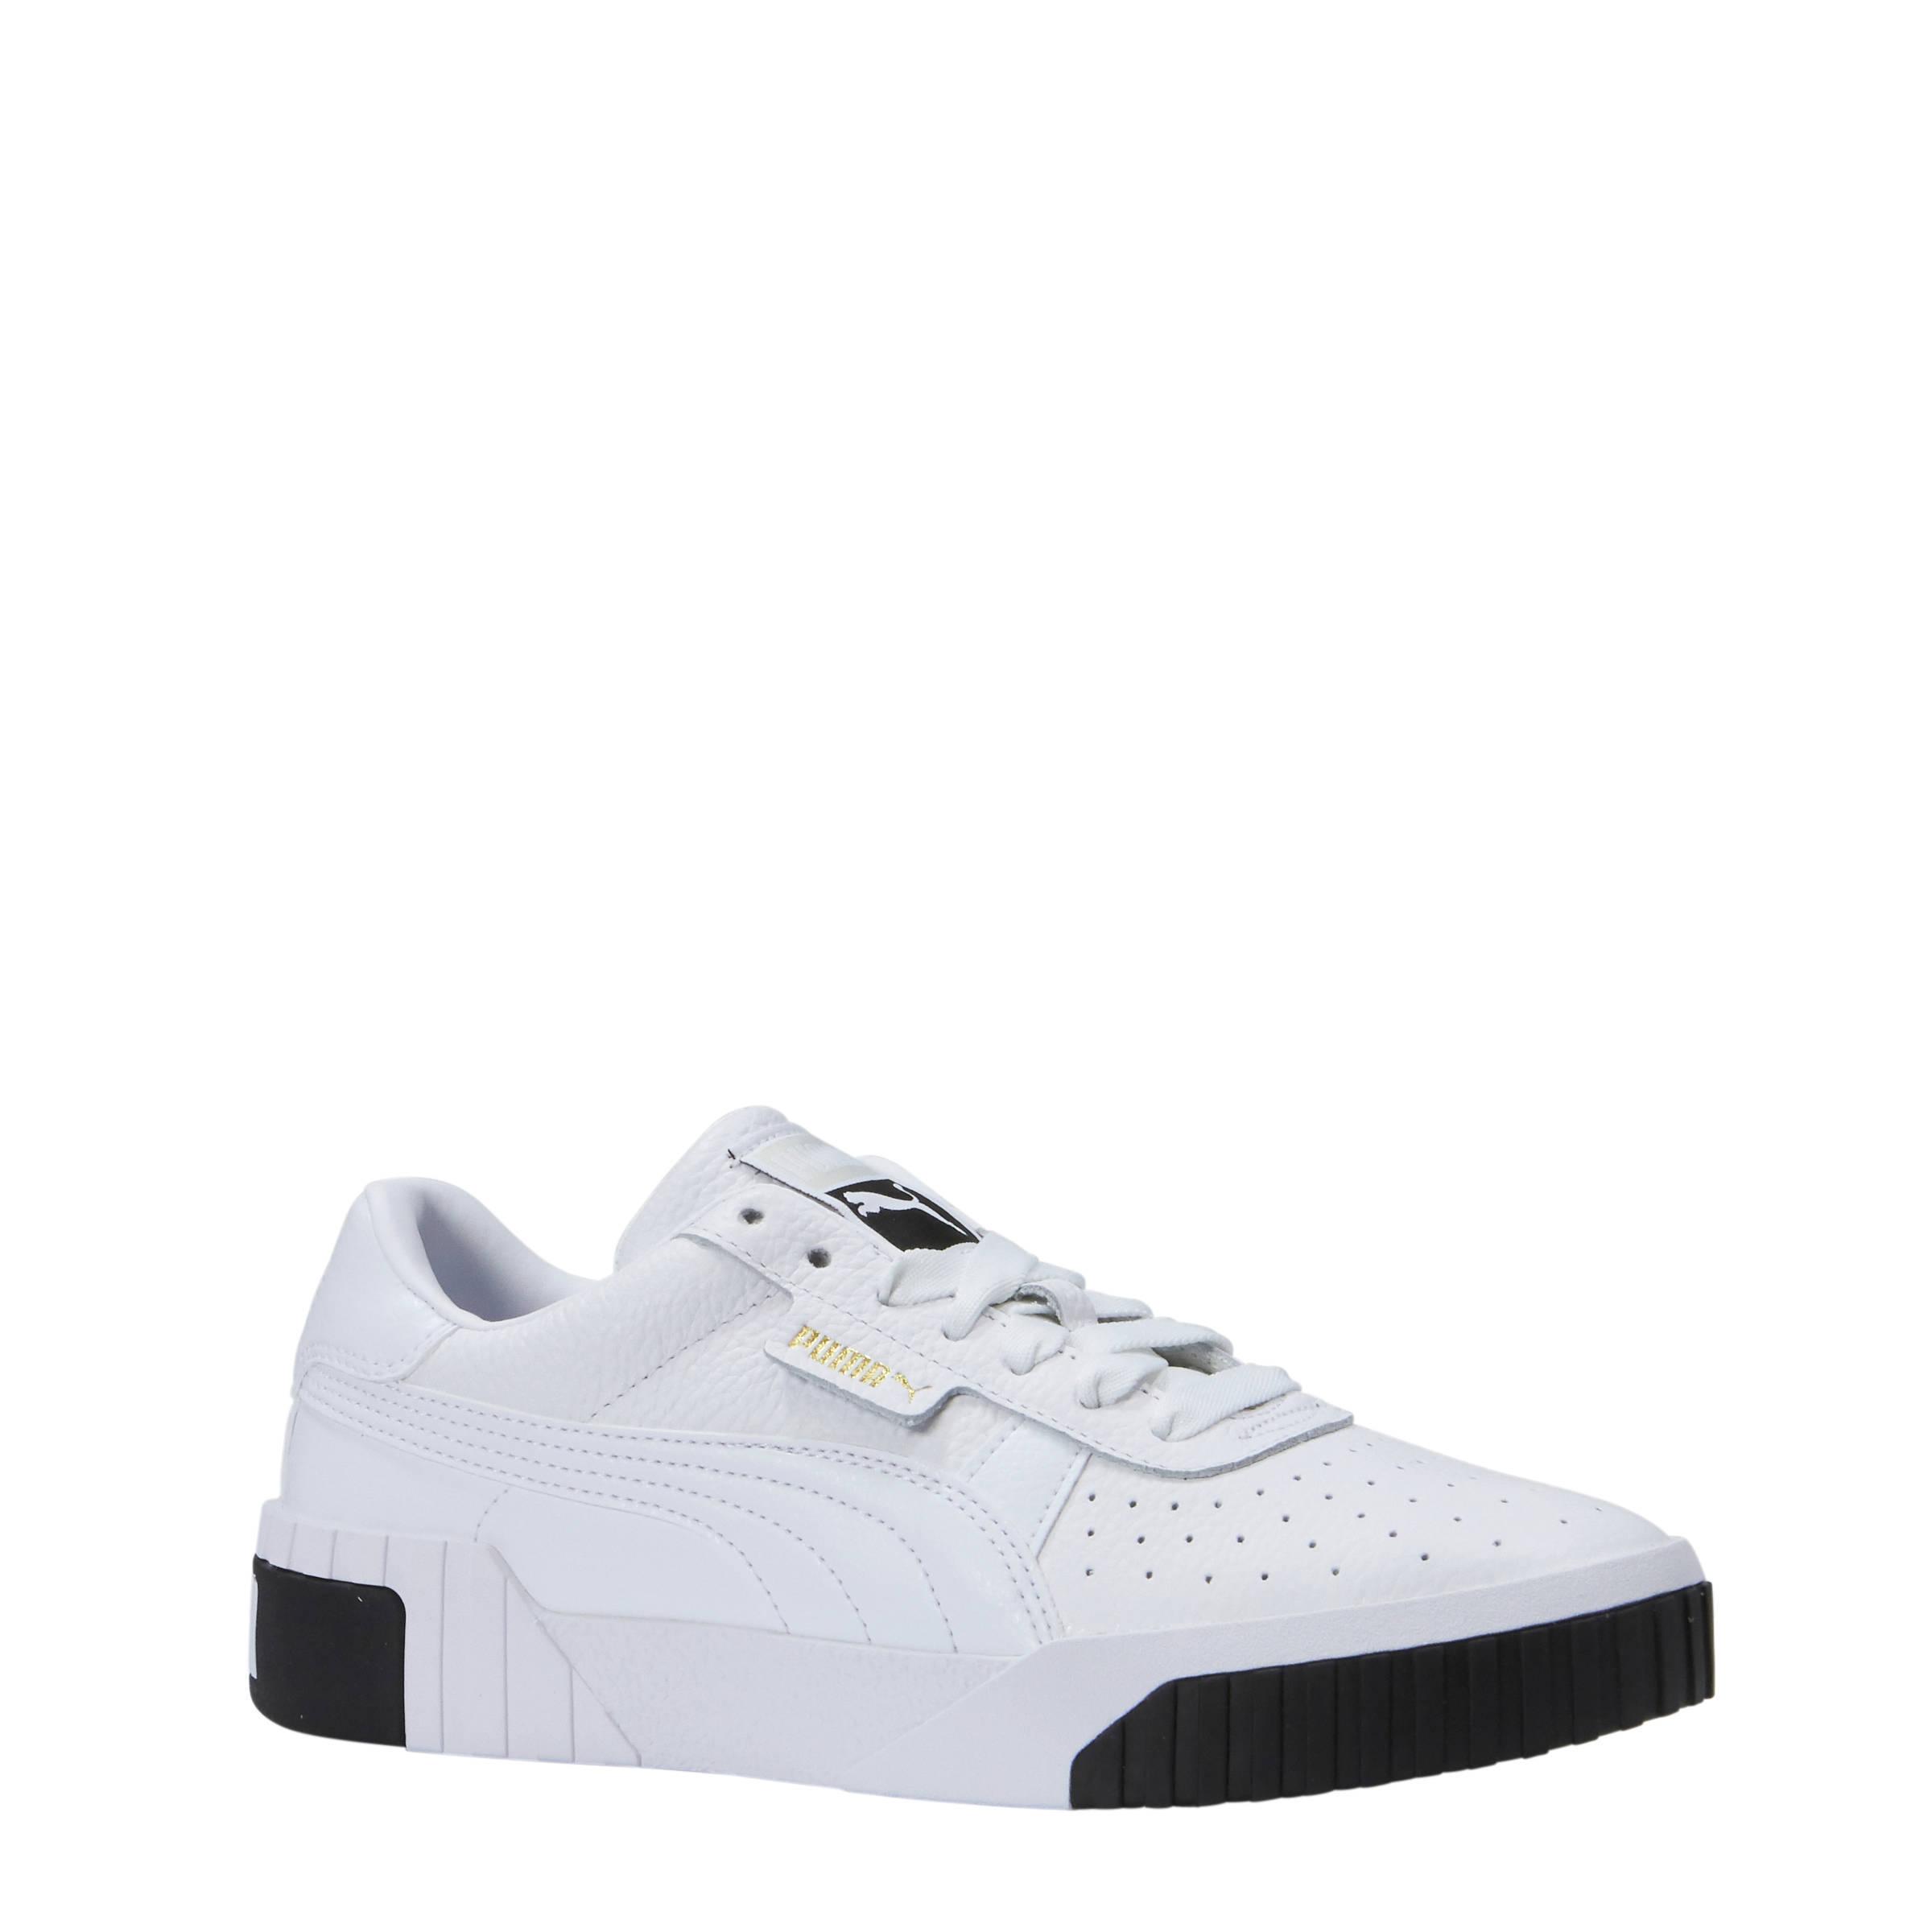 Puma sneakers Cali wit | wehkamp